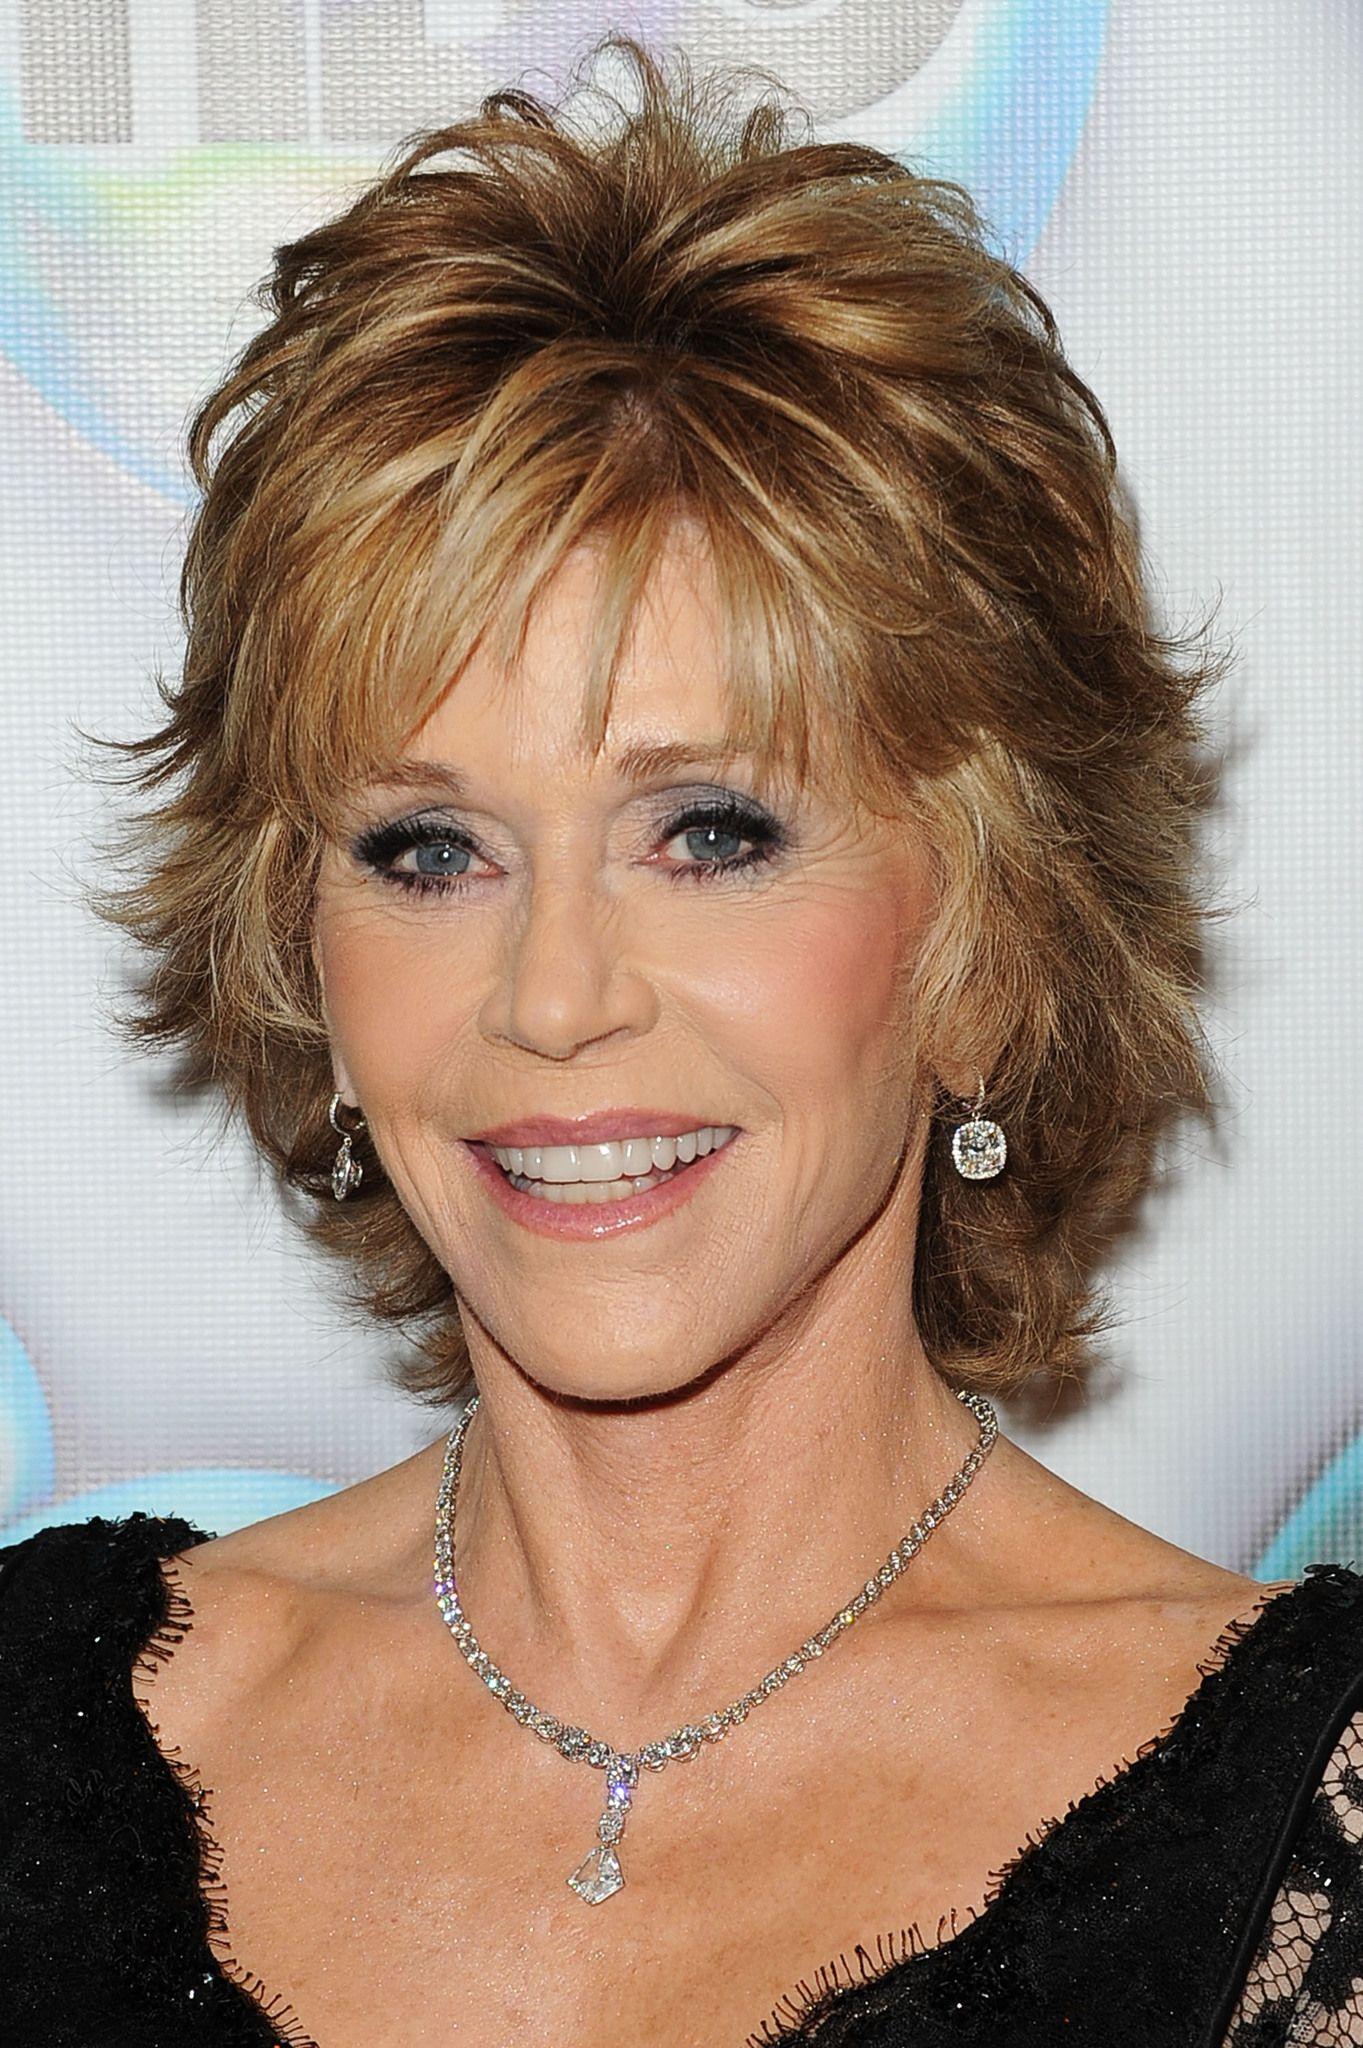 & s of Jane Fonda IMDb Hair styles